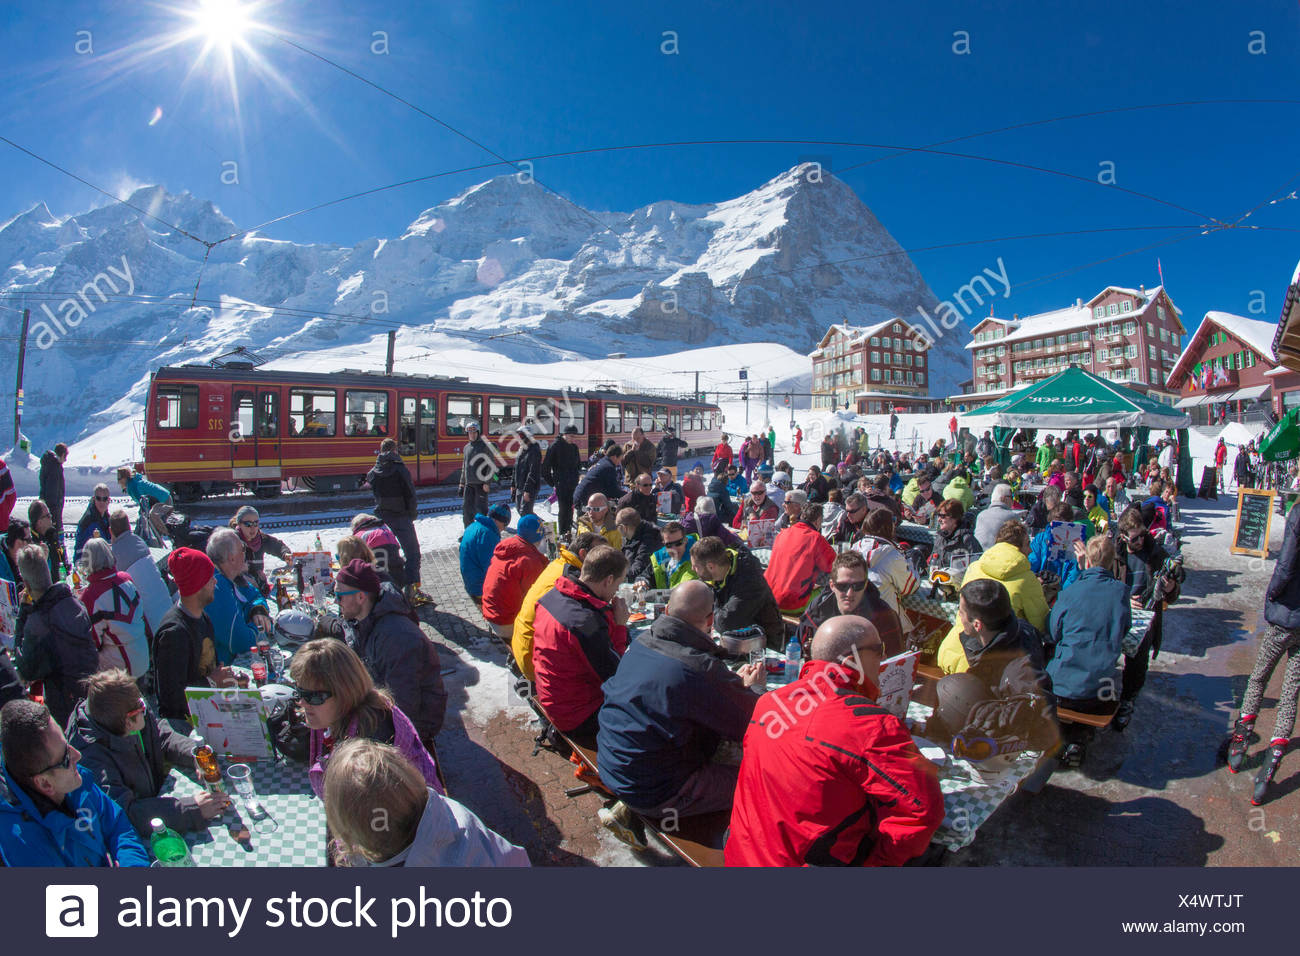 Jungfrau railroad, railway station, Kleine Scheidegg, Eiger, monk, Mönch, Jungfrau, mountain, mountains, ski, skiing, Carving, w - Stock Image